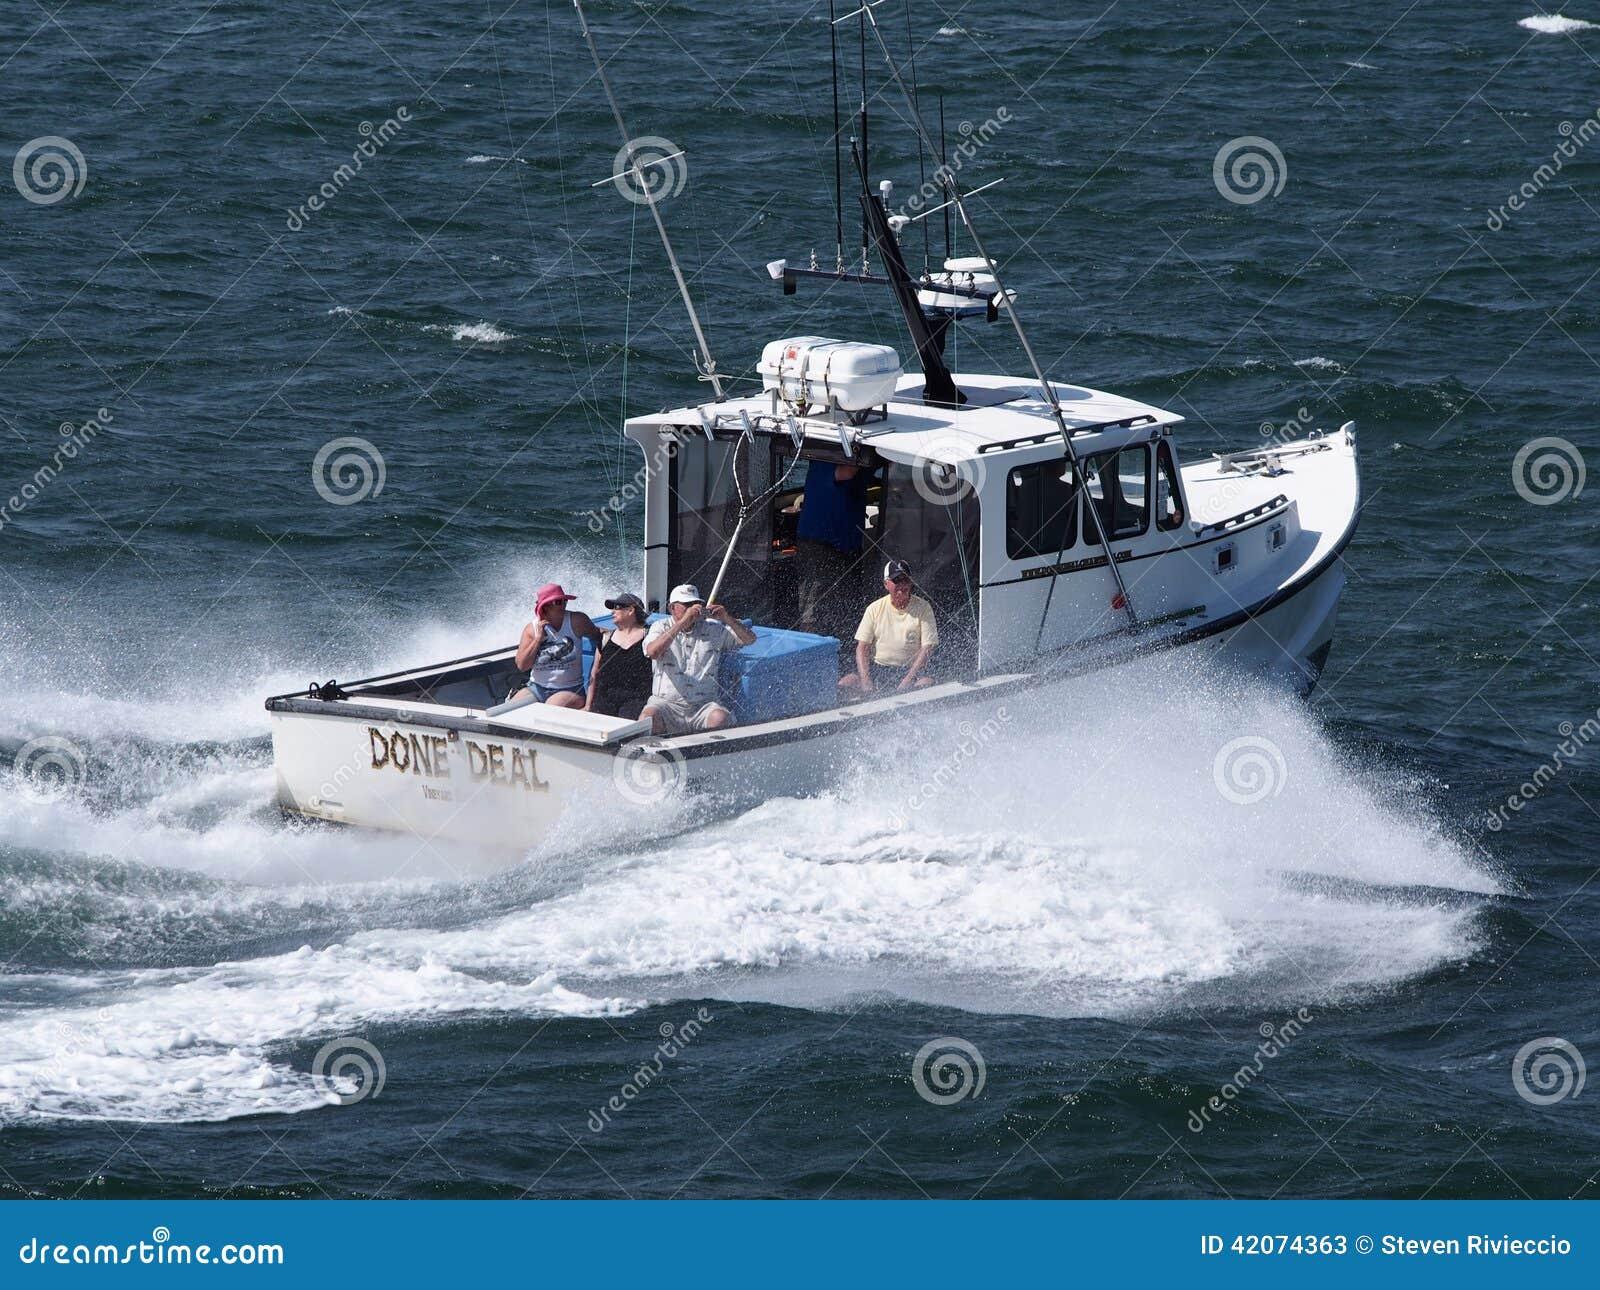 Deep sea fishing charter editorial stock photo image for Deep sea fishing charters near me